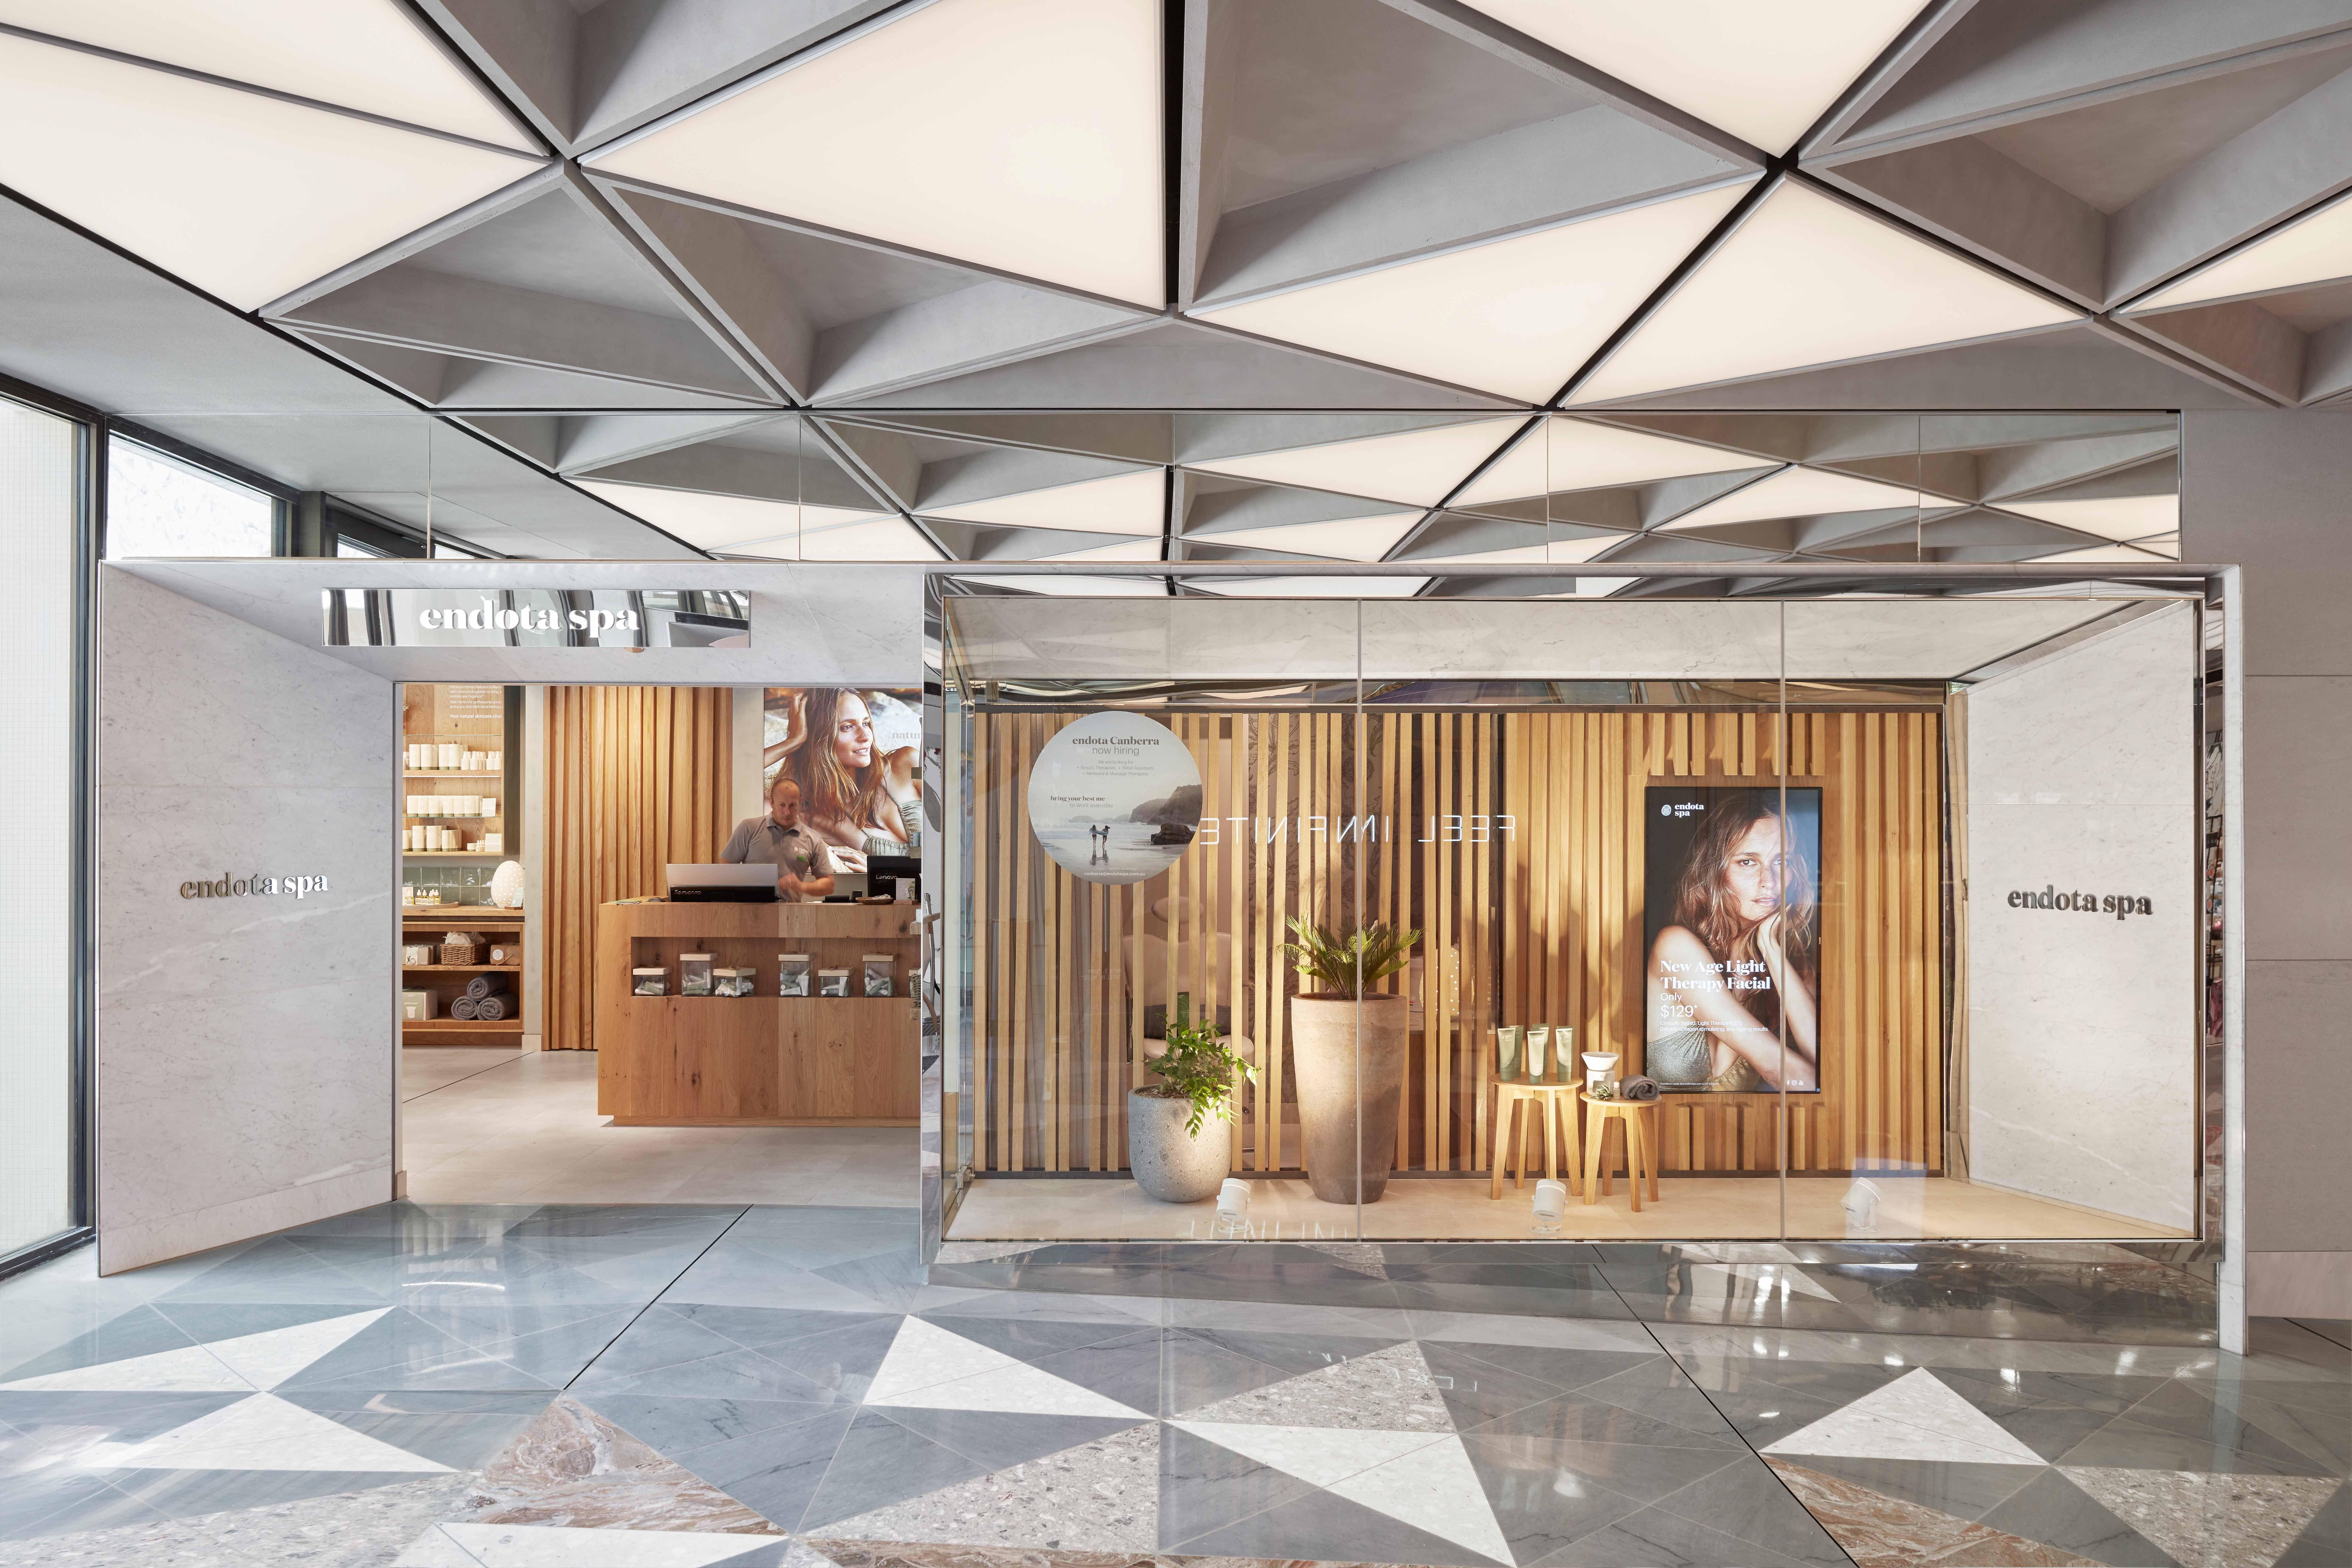 Ainslie Mall Monaro Mall Ceiling Design Shop Interior Design